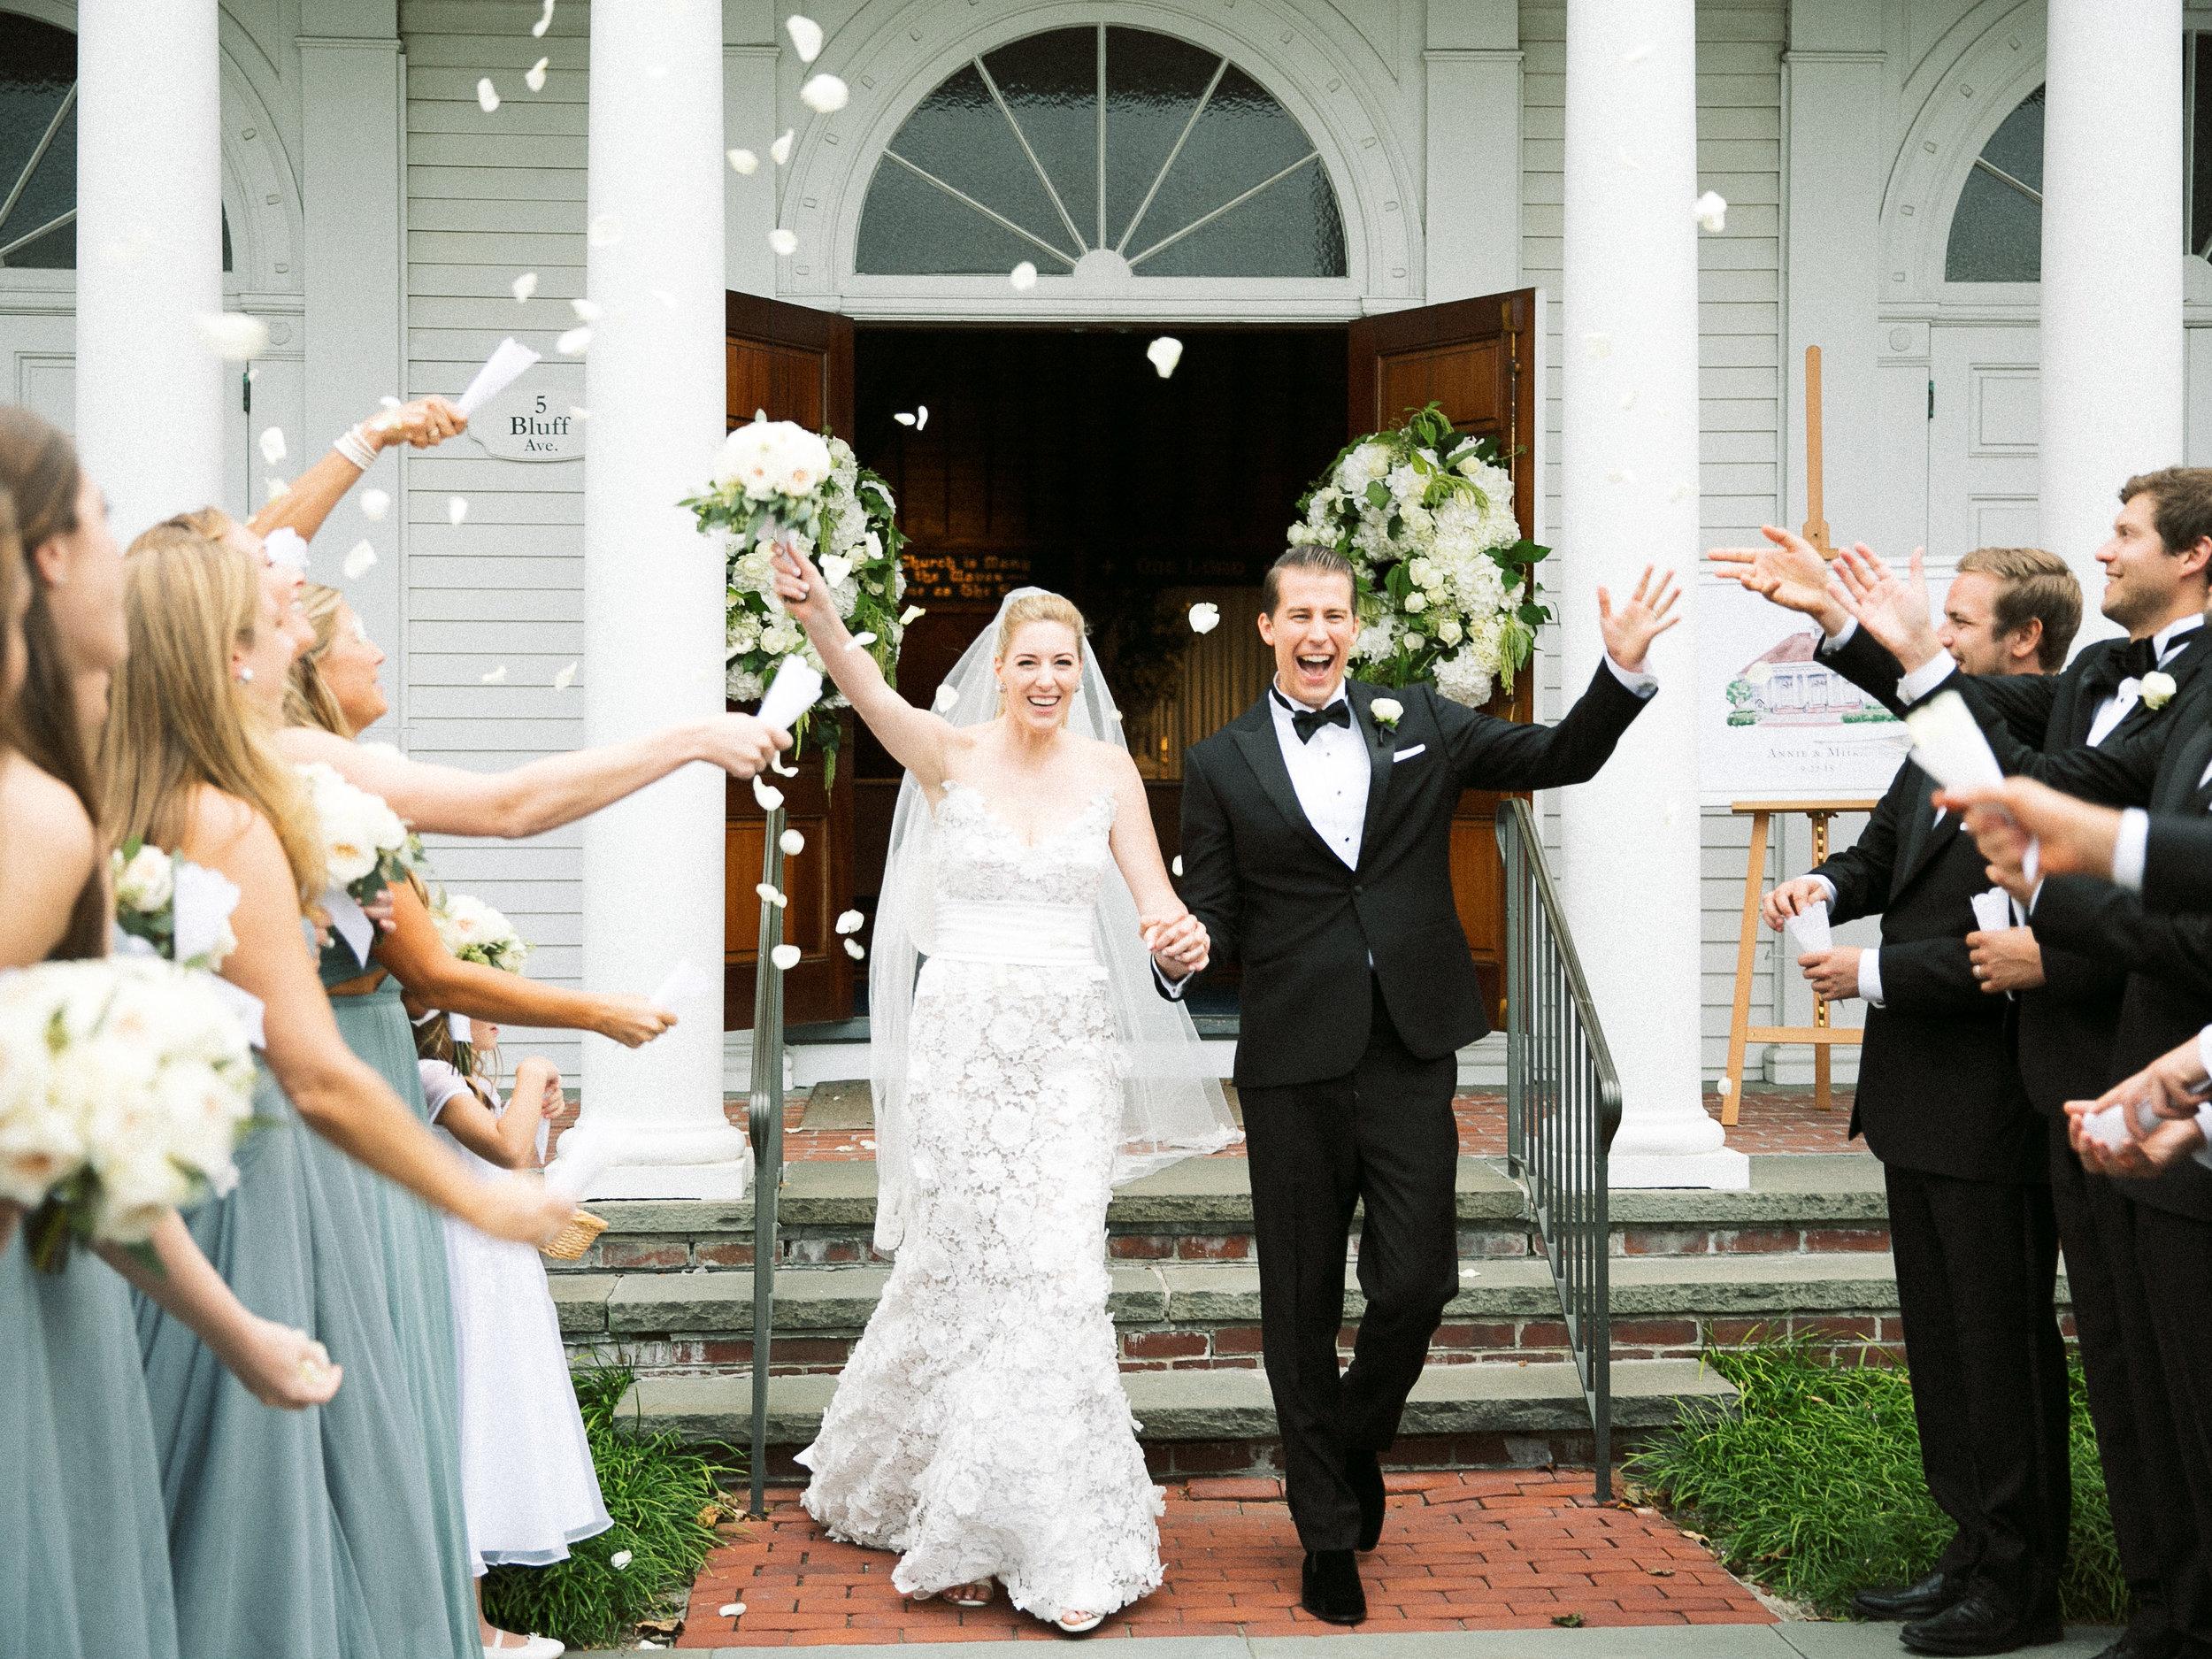 Watch Hill Chapel Wedding, Westerly RI, Classic New England Wedding, Coastal Wedding, September Wedding, Flower Petals, Nicole Simeral Wedding Planner.